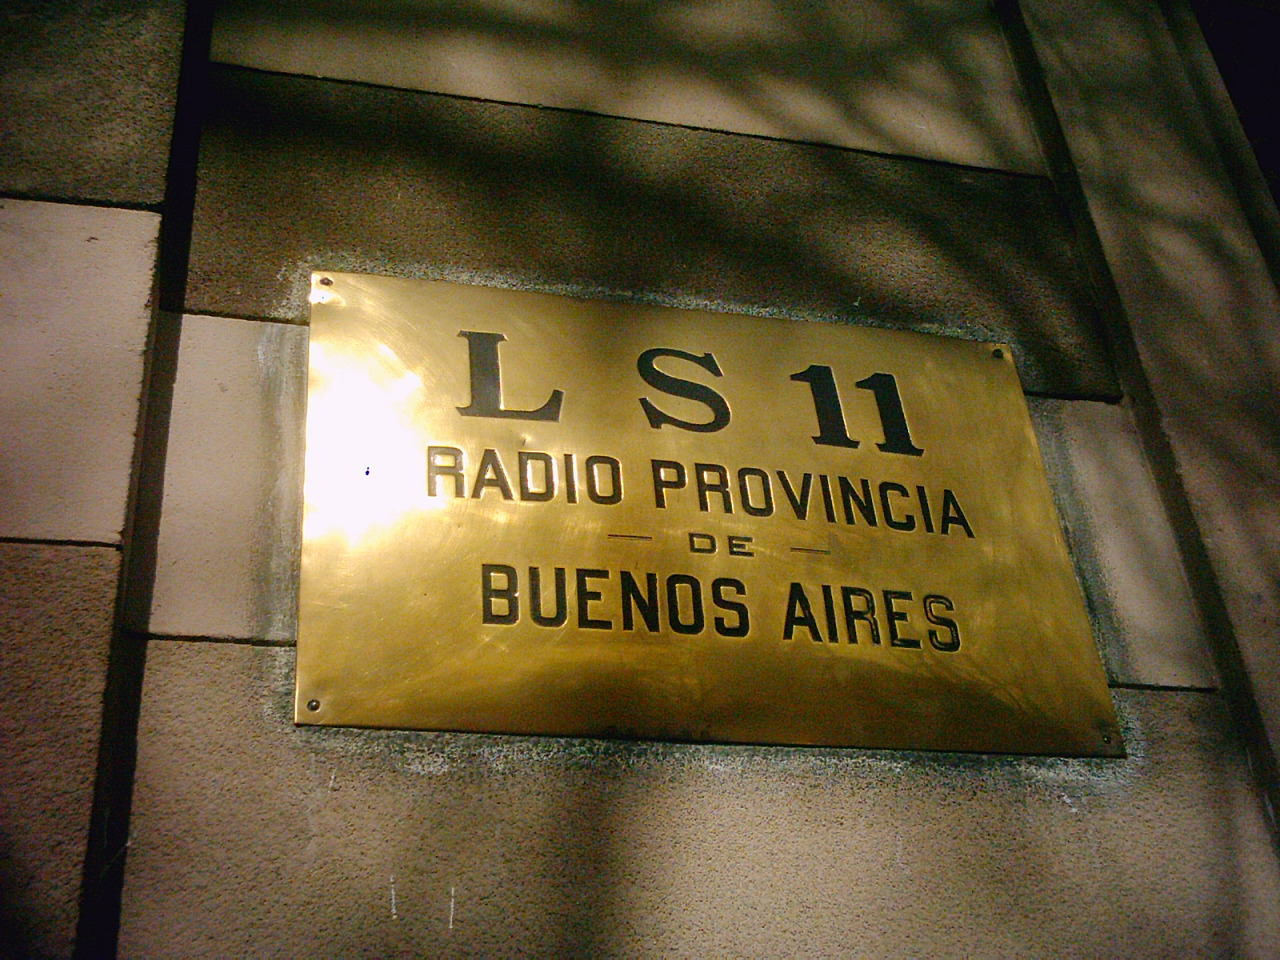 FOTOGRAFIAS-LS11 RADIO PROVINCIAS DE BUENOS AIRES